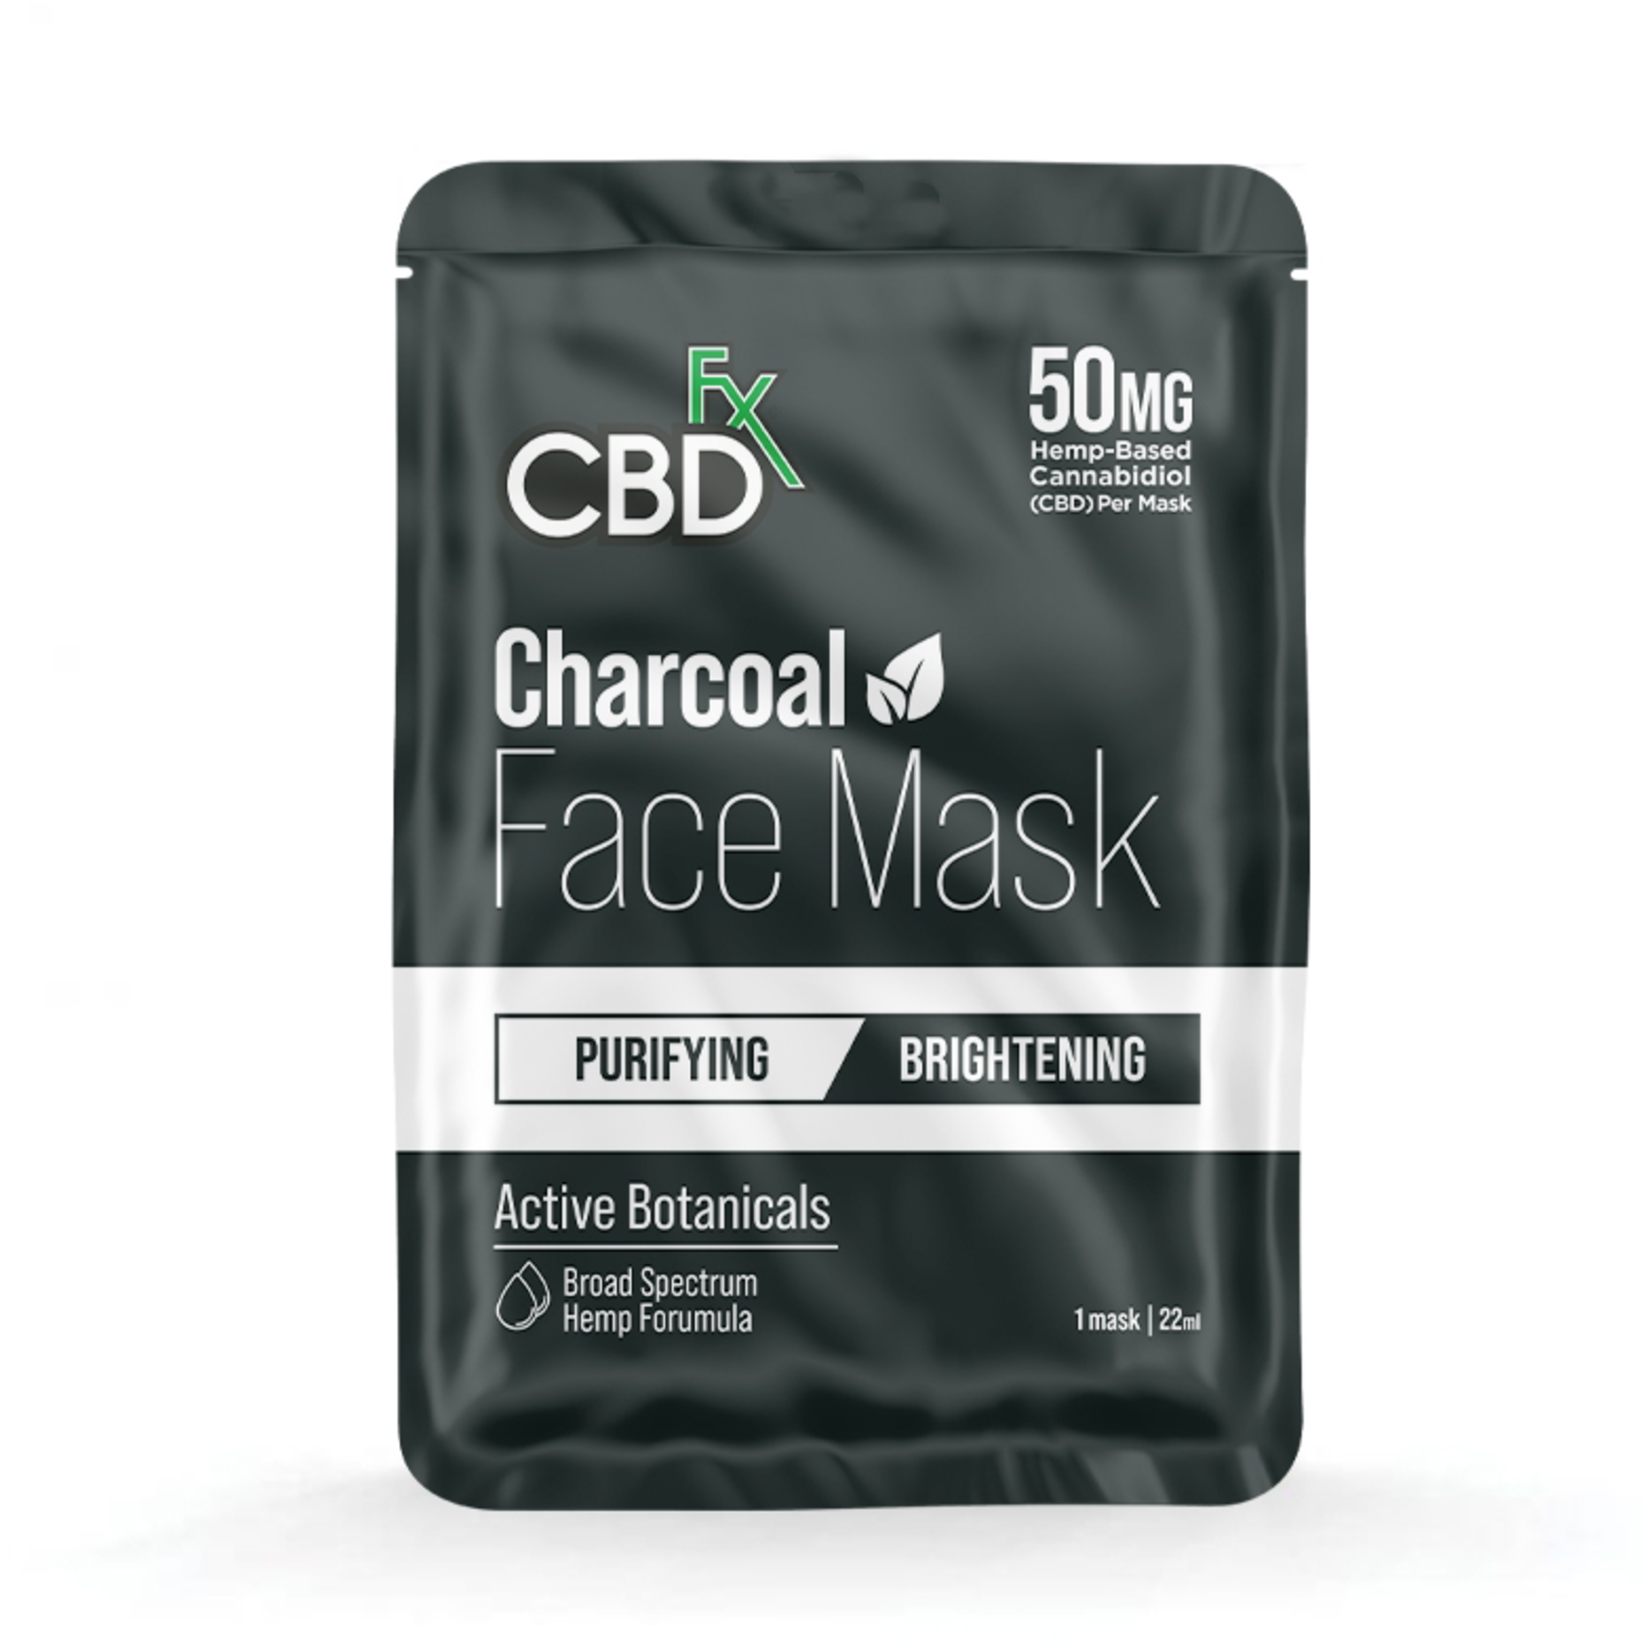 CBDFX CBD Hemp Face Mask 50mg